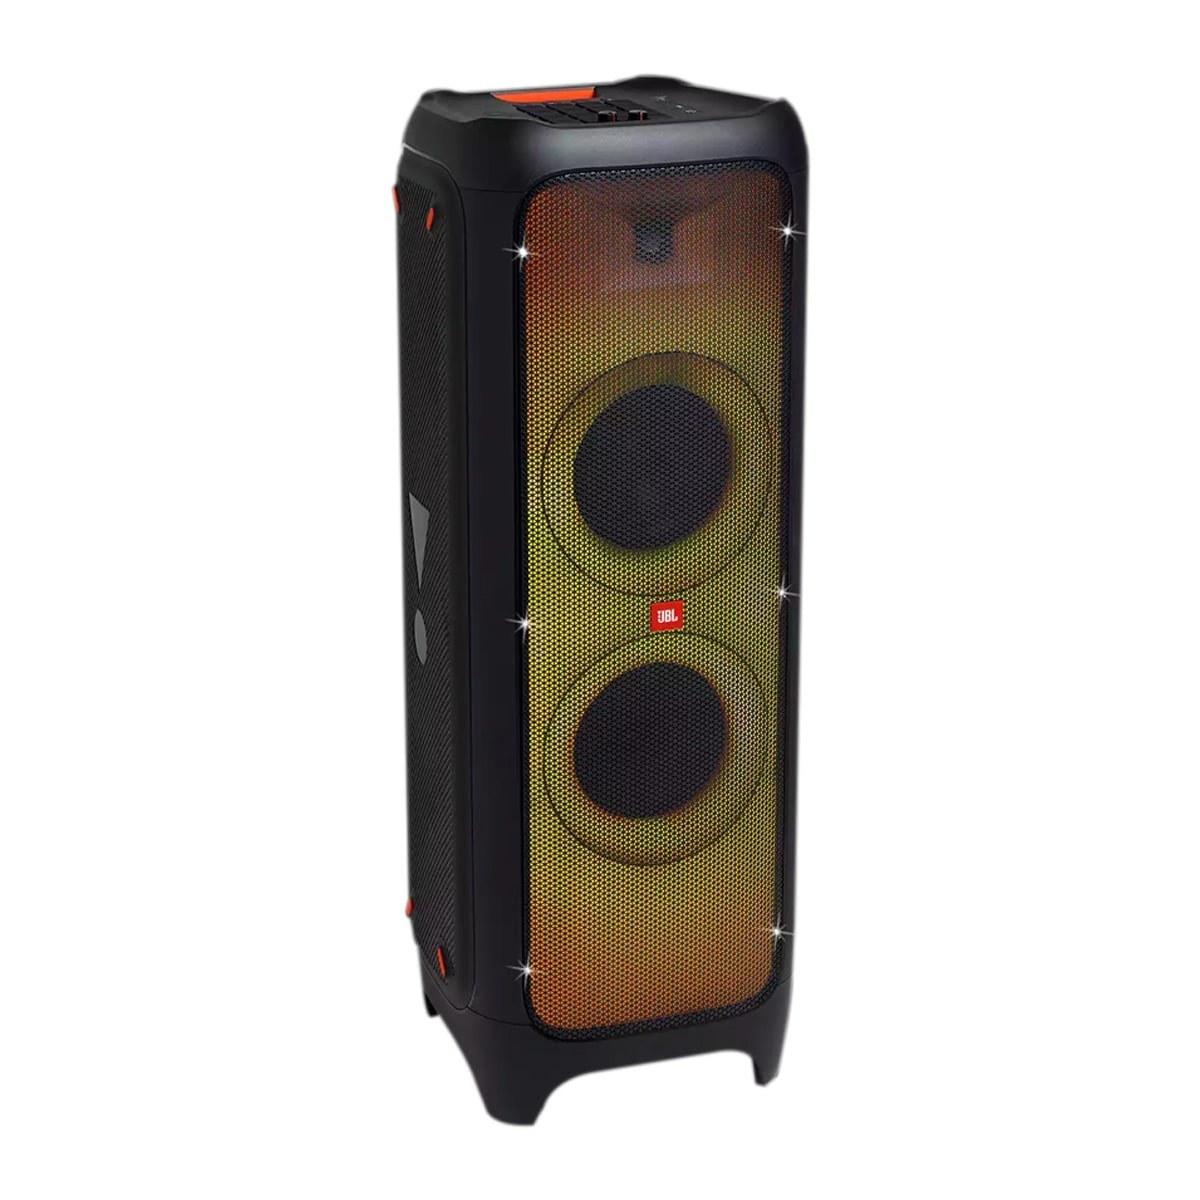 تصویر اسپیکر بلوتوثی قابل حمل جی بی ال مدل Party Box 1000 JBL Party Box 1000 Portable Bluetooth Speaker